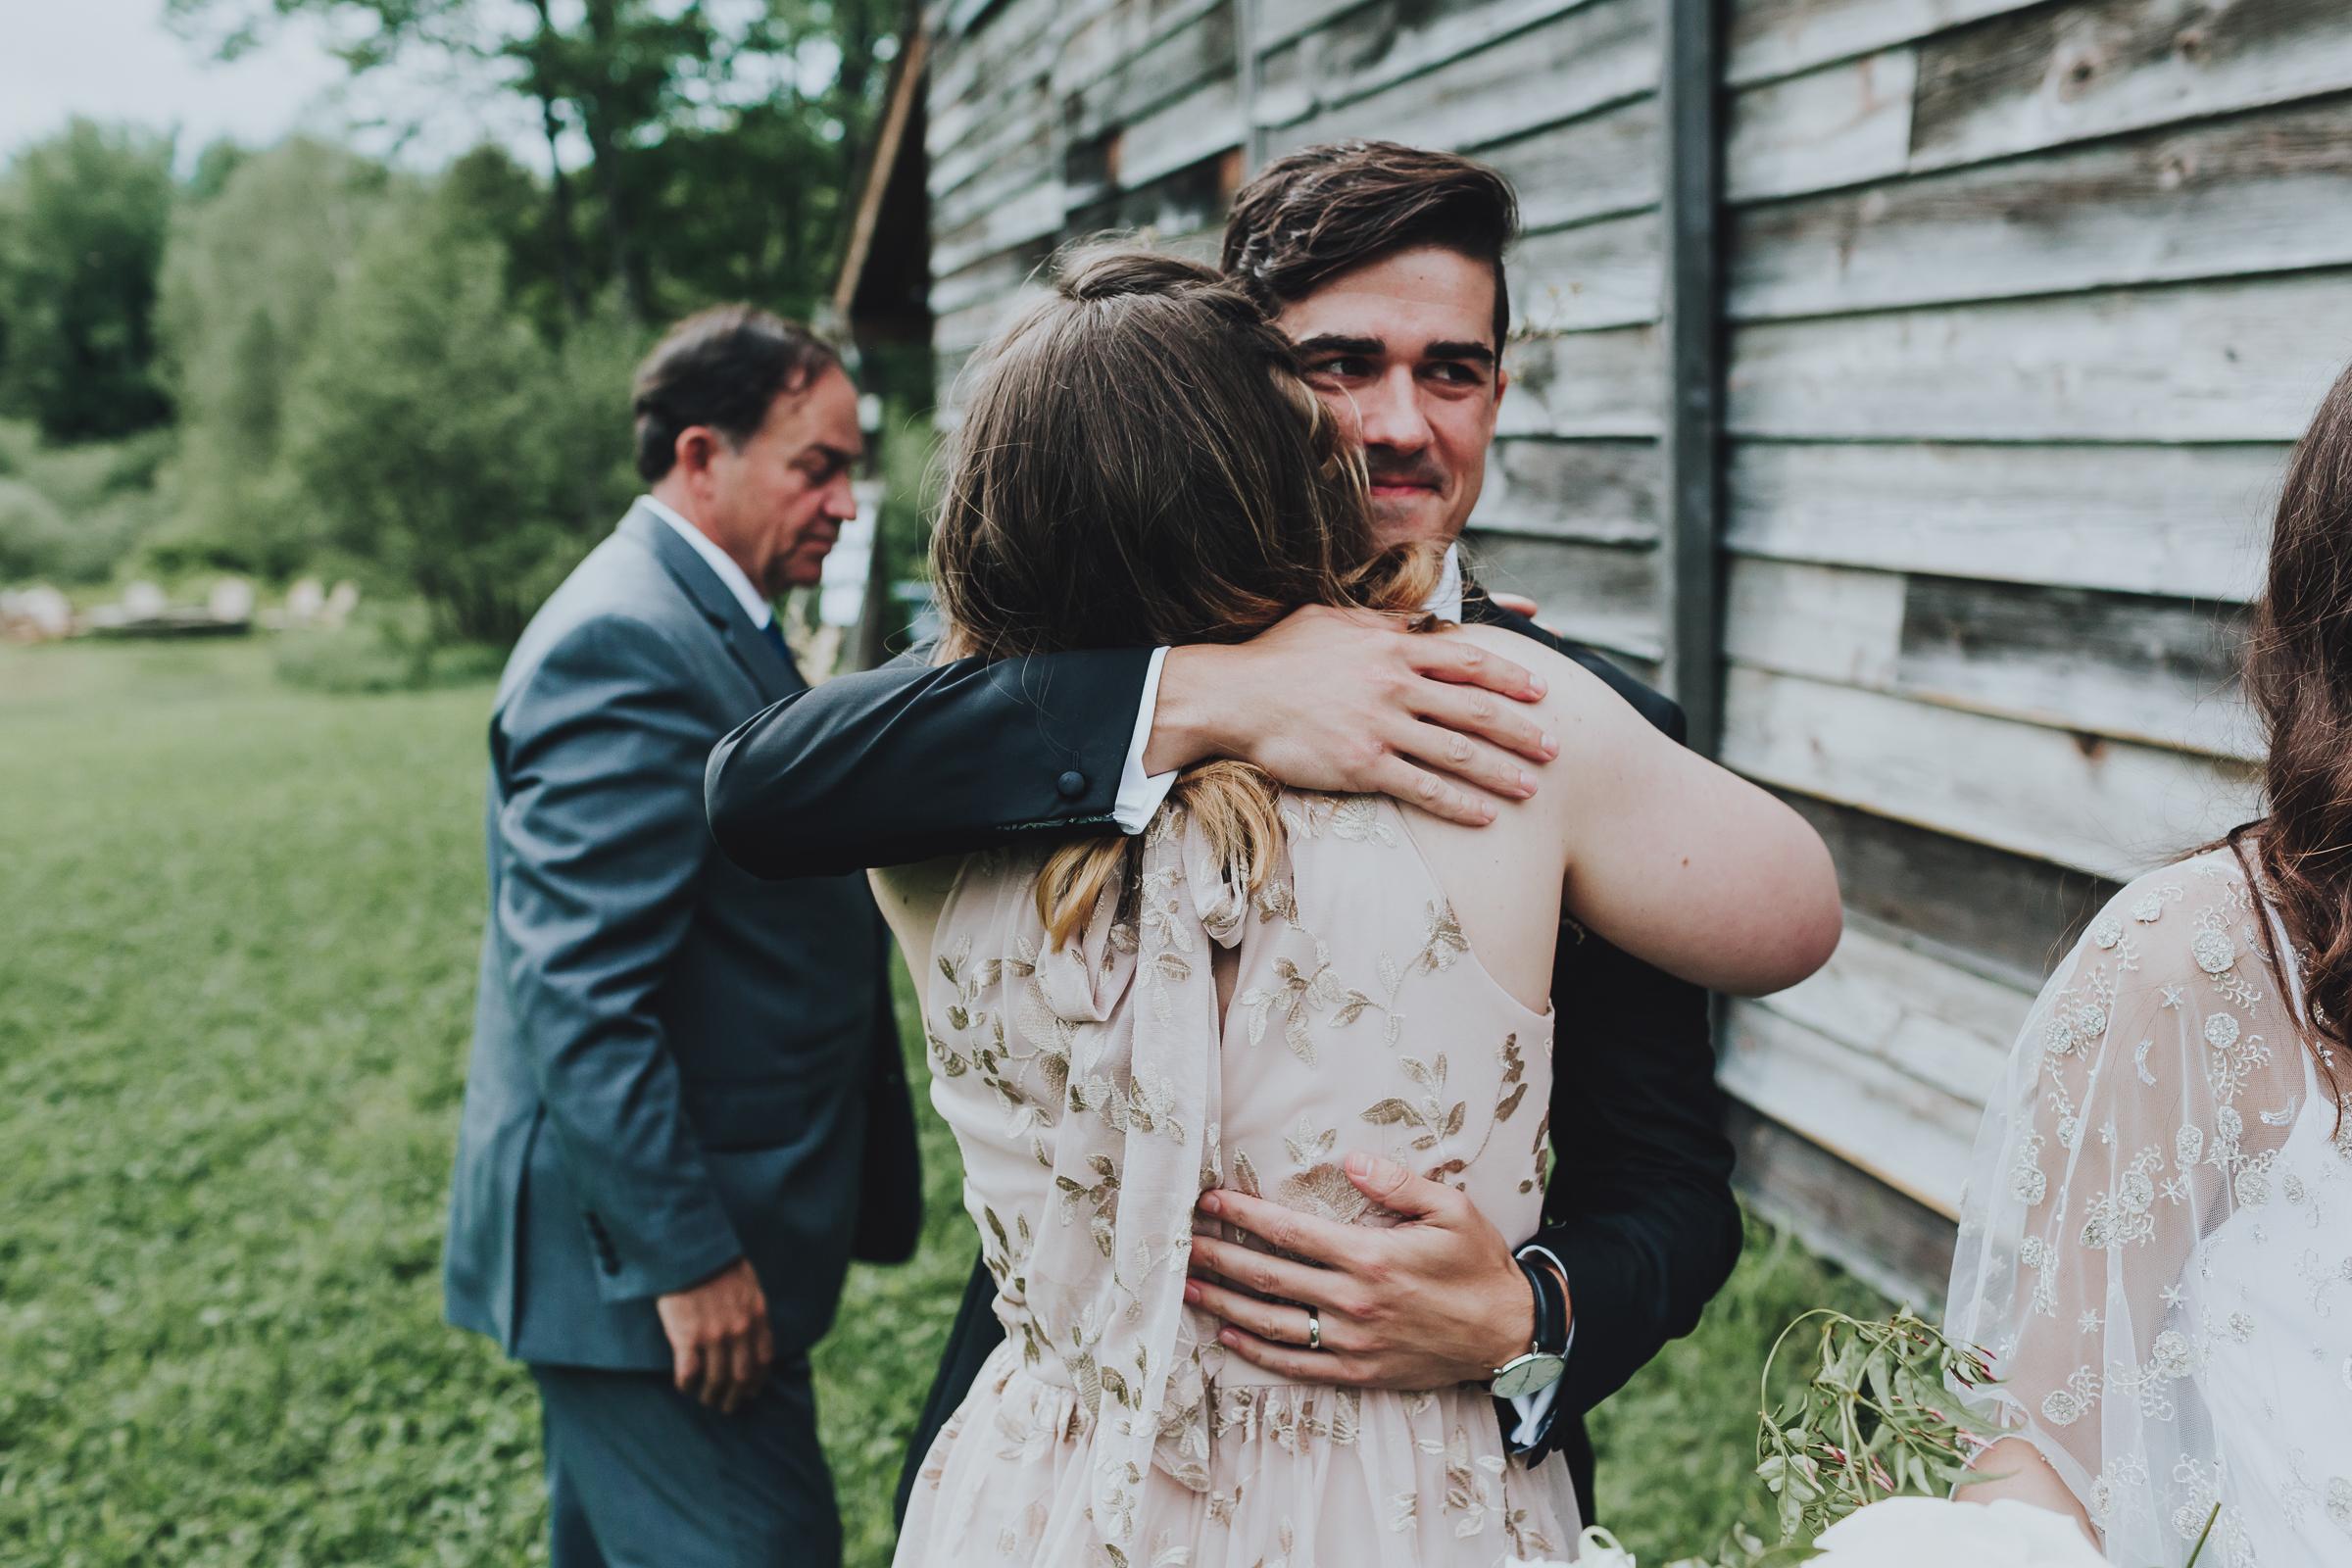 Handsome-Hollow-Long-Eddy-Catskills-New-York-Fine-Art-Documentary-Wedding-Photographer-76.jpg